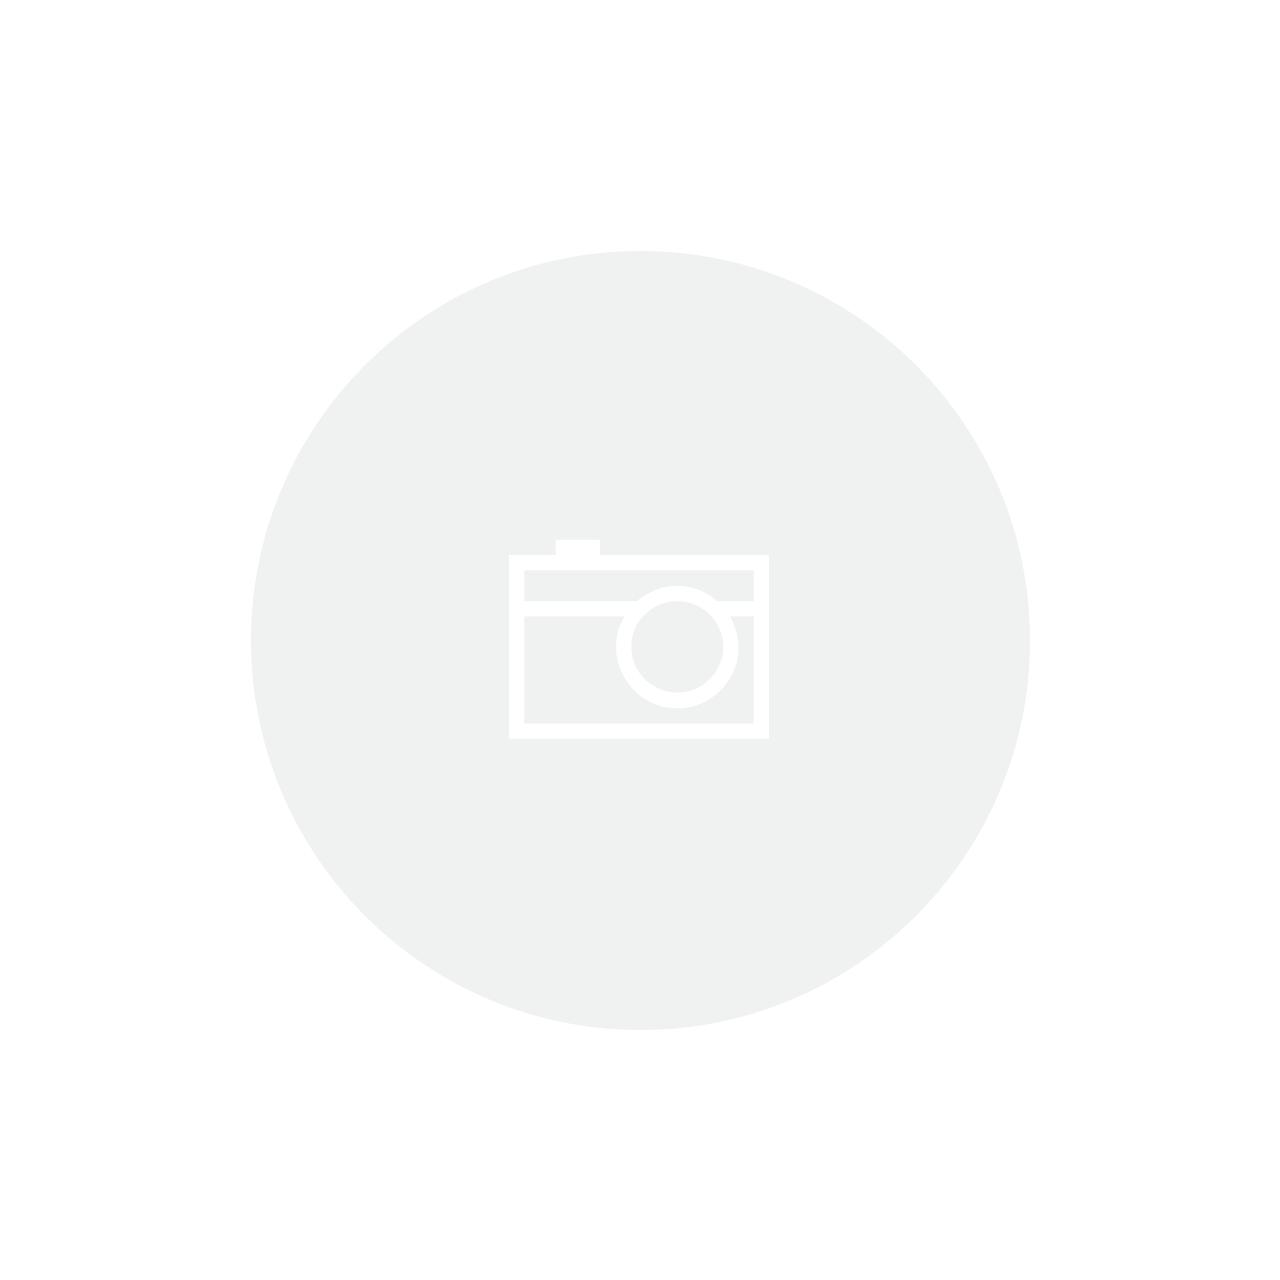 BICICLETA 29 BMC TEAMELITE 01 THREE 2019 11V XT